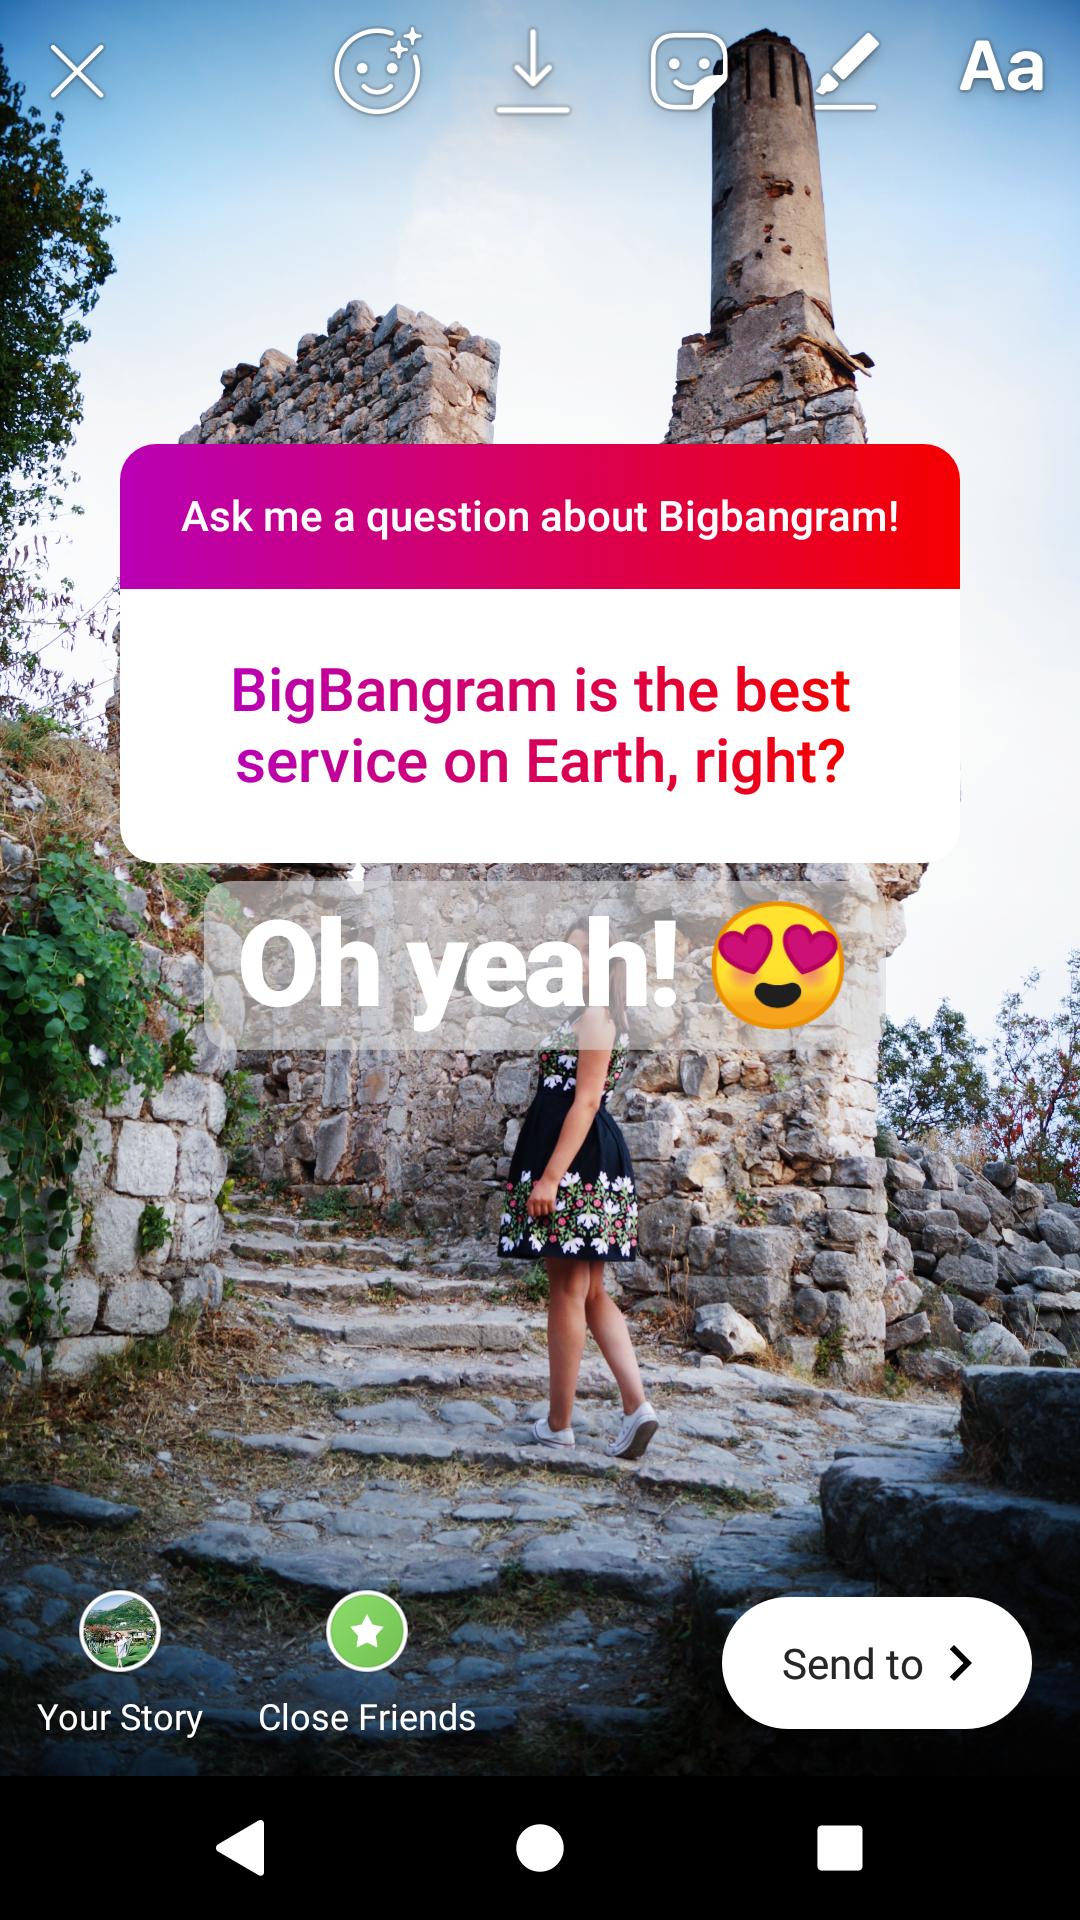 Idea for instagram story